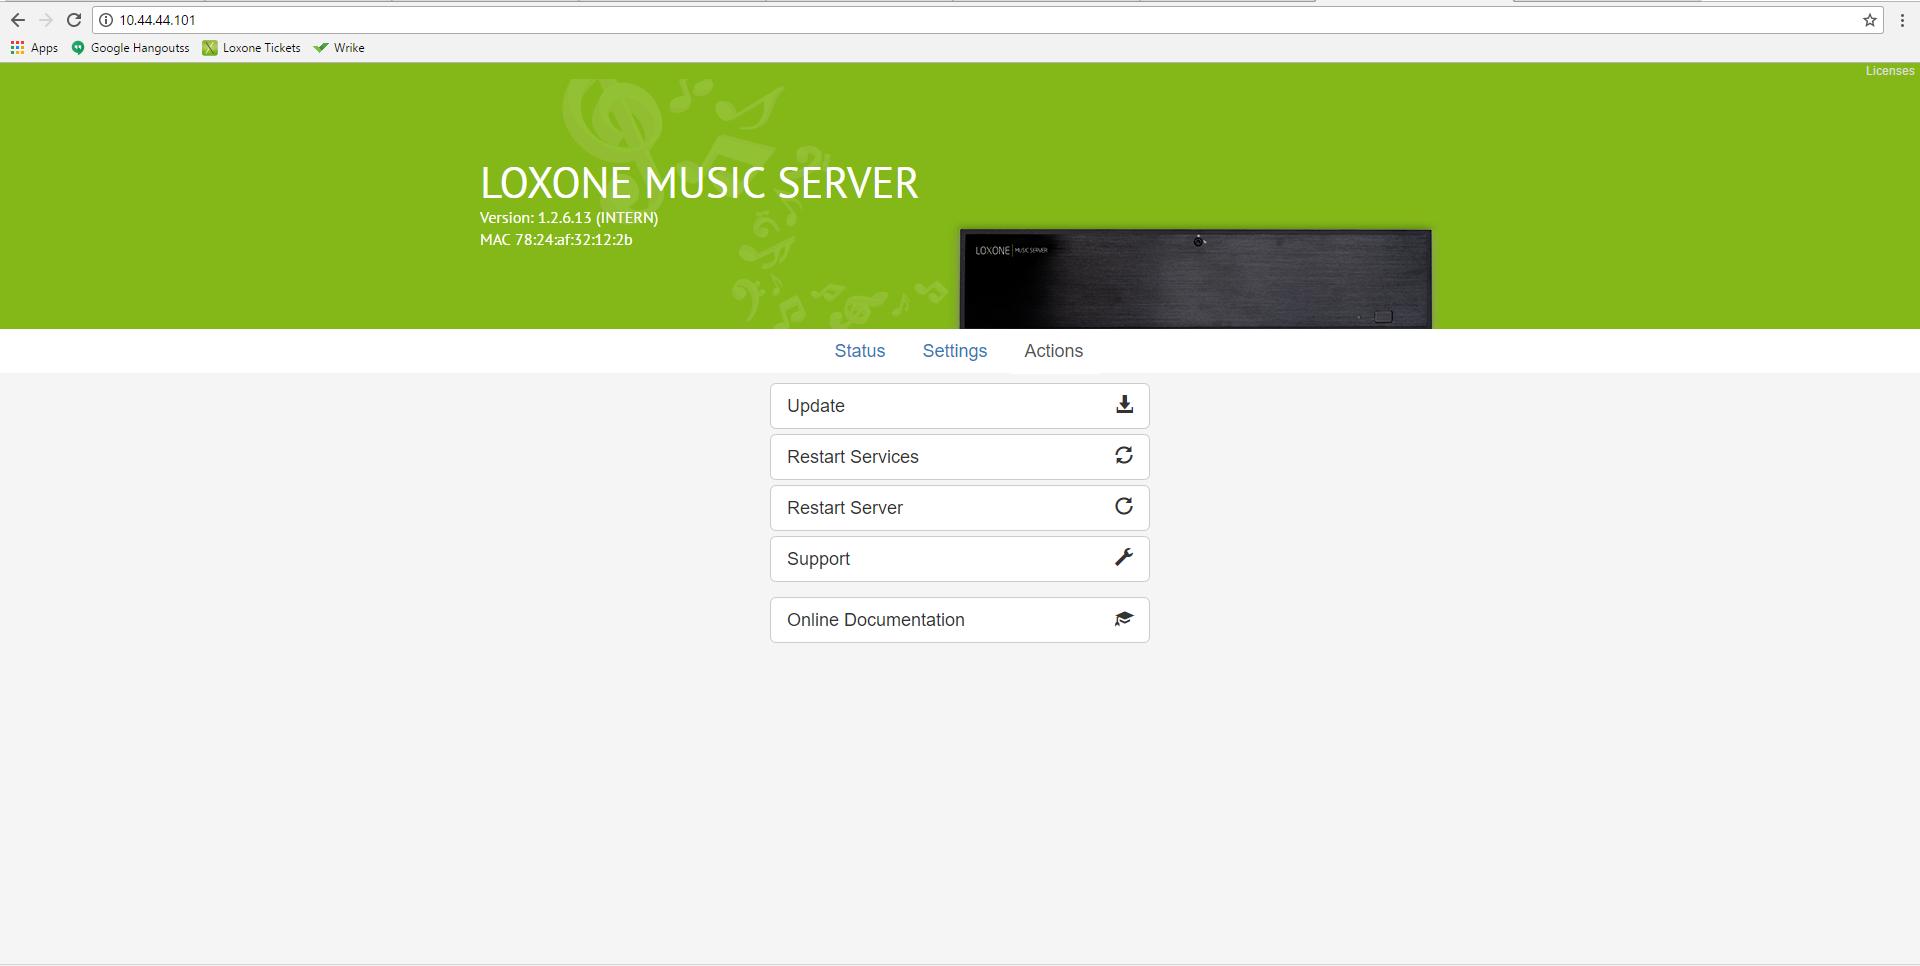 Documentation - Loxone Music Server